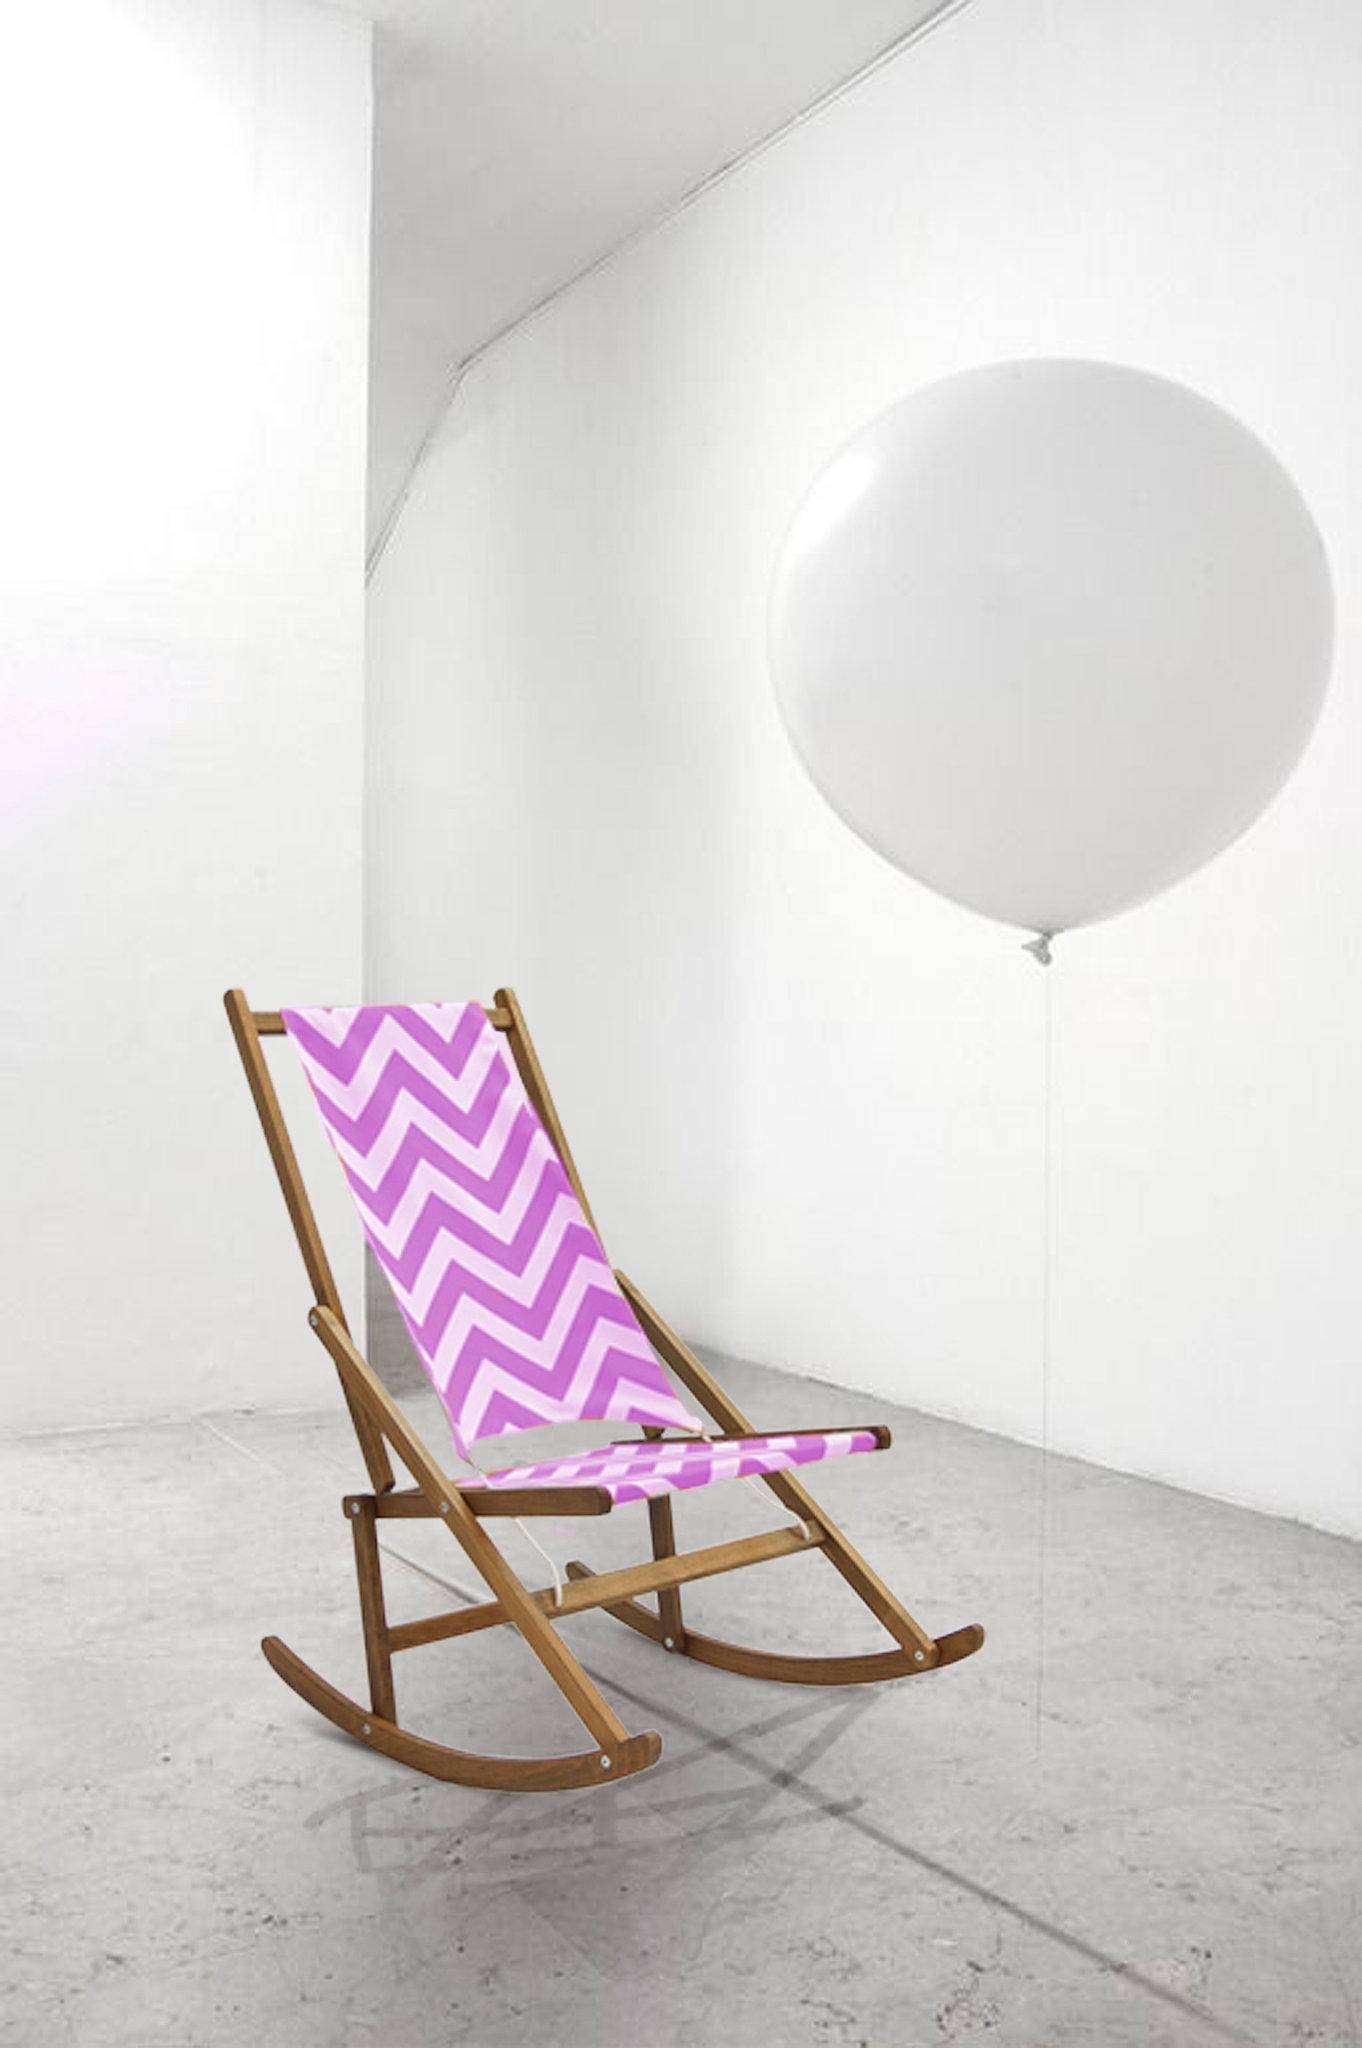 Floor rocking chair folding chair rocking chair - Floor Rocking Chair Folding Chair Rocking Chair 35